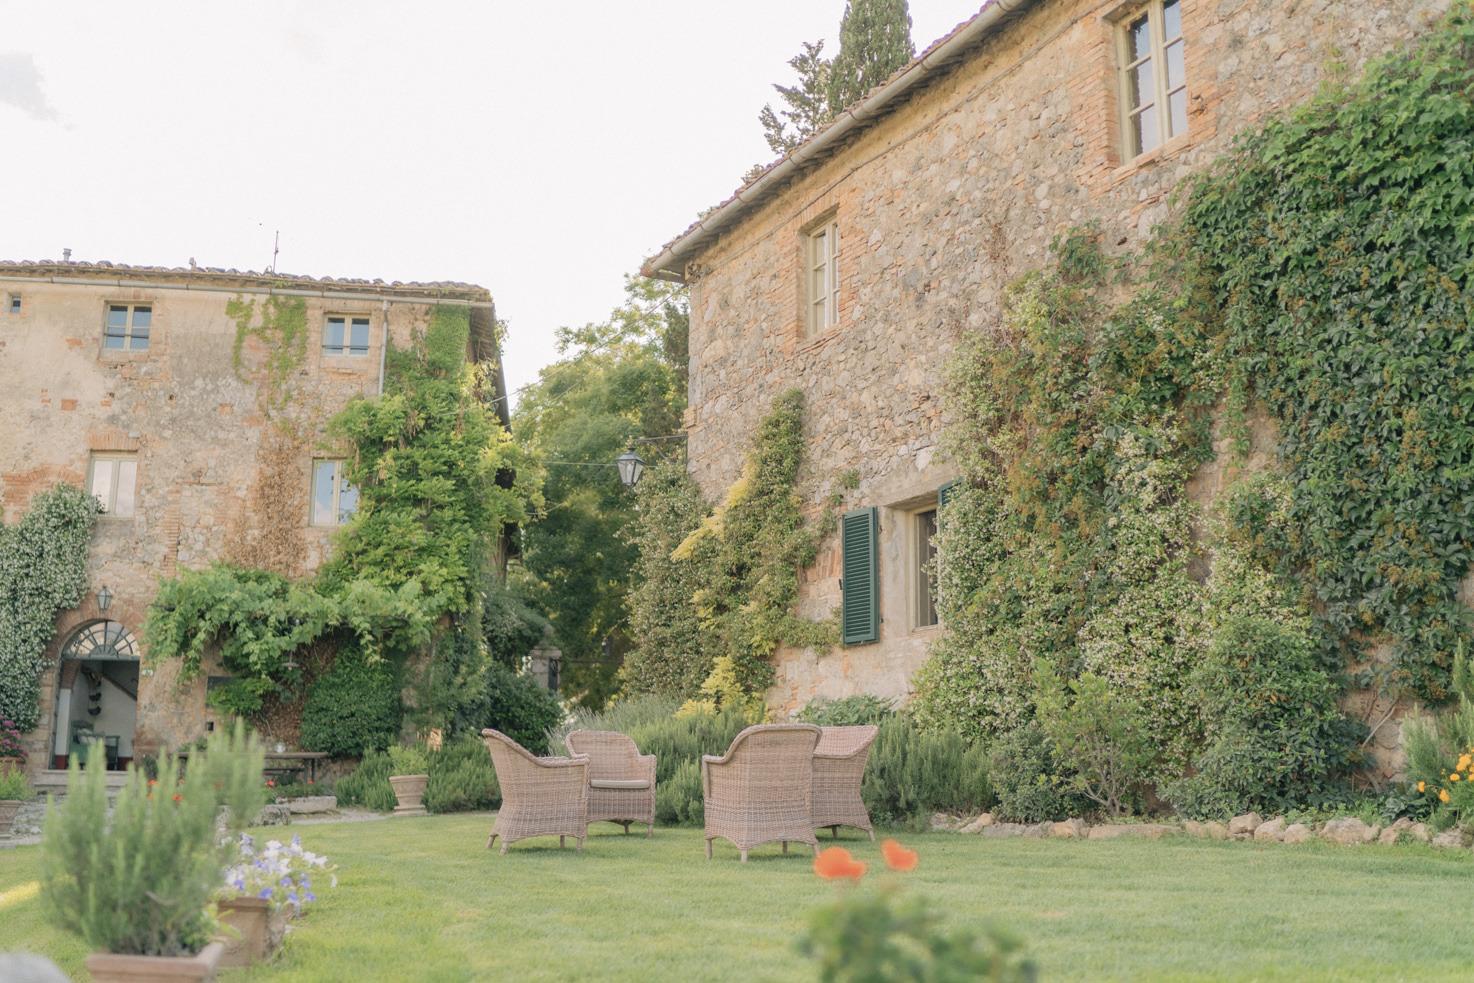 Exterior of Borgo Stomennano